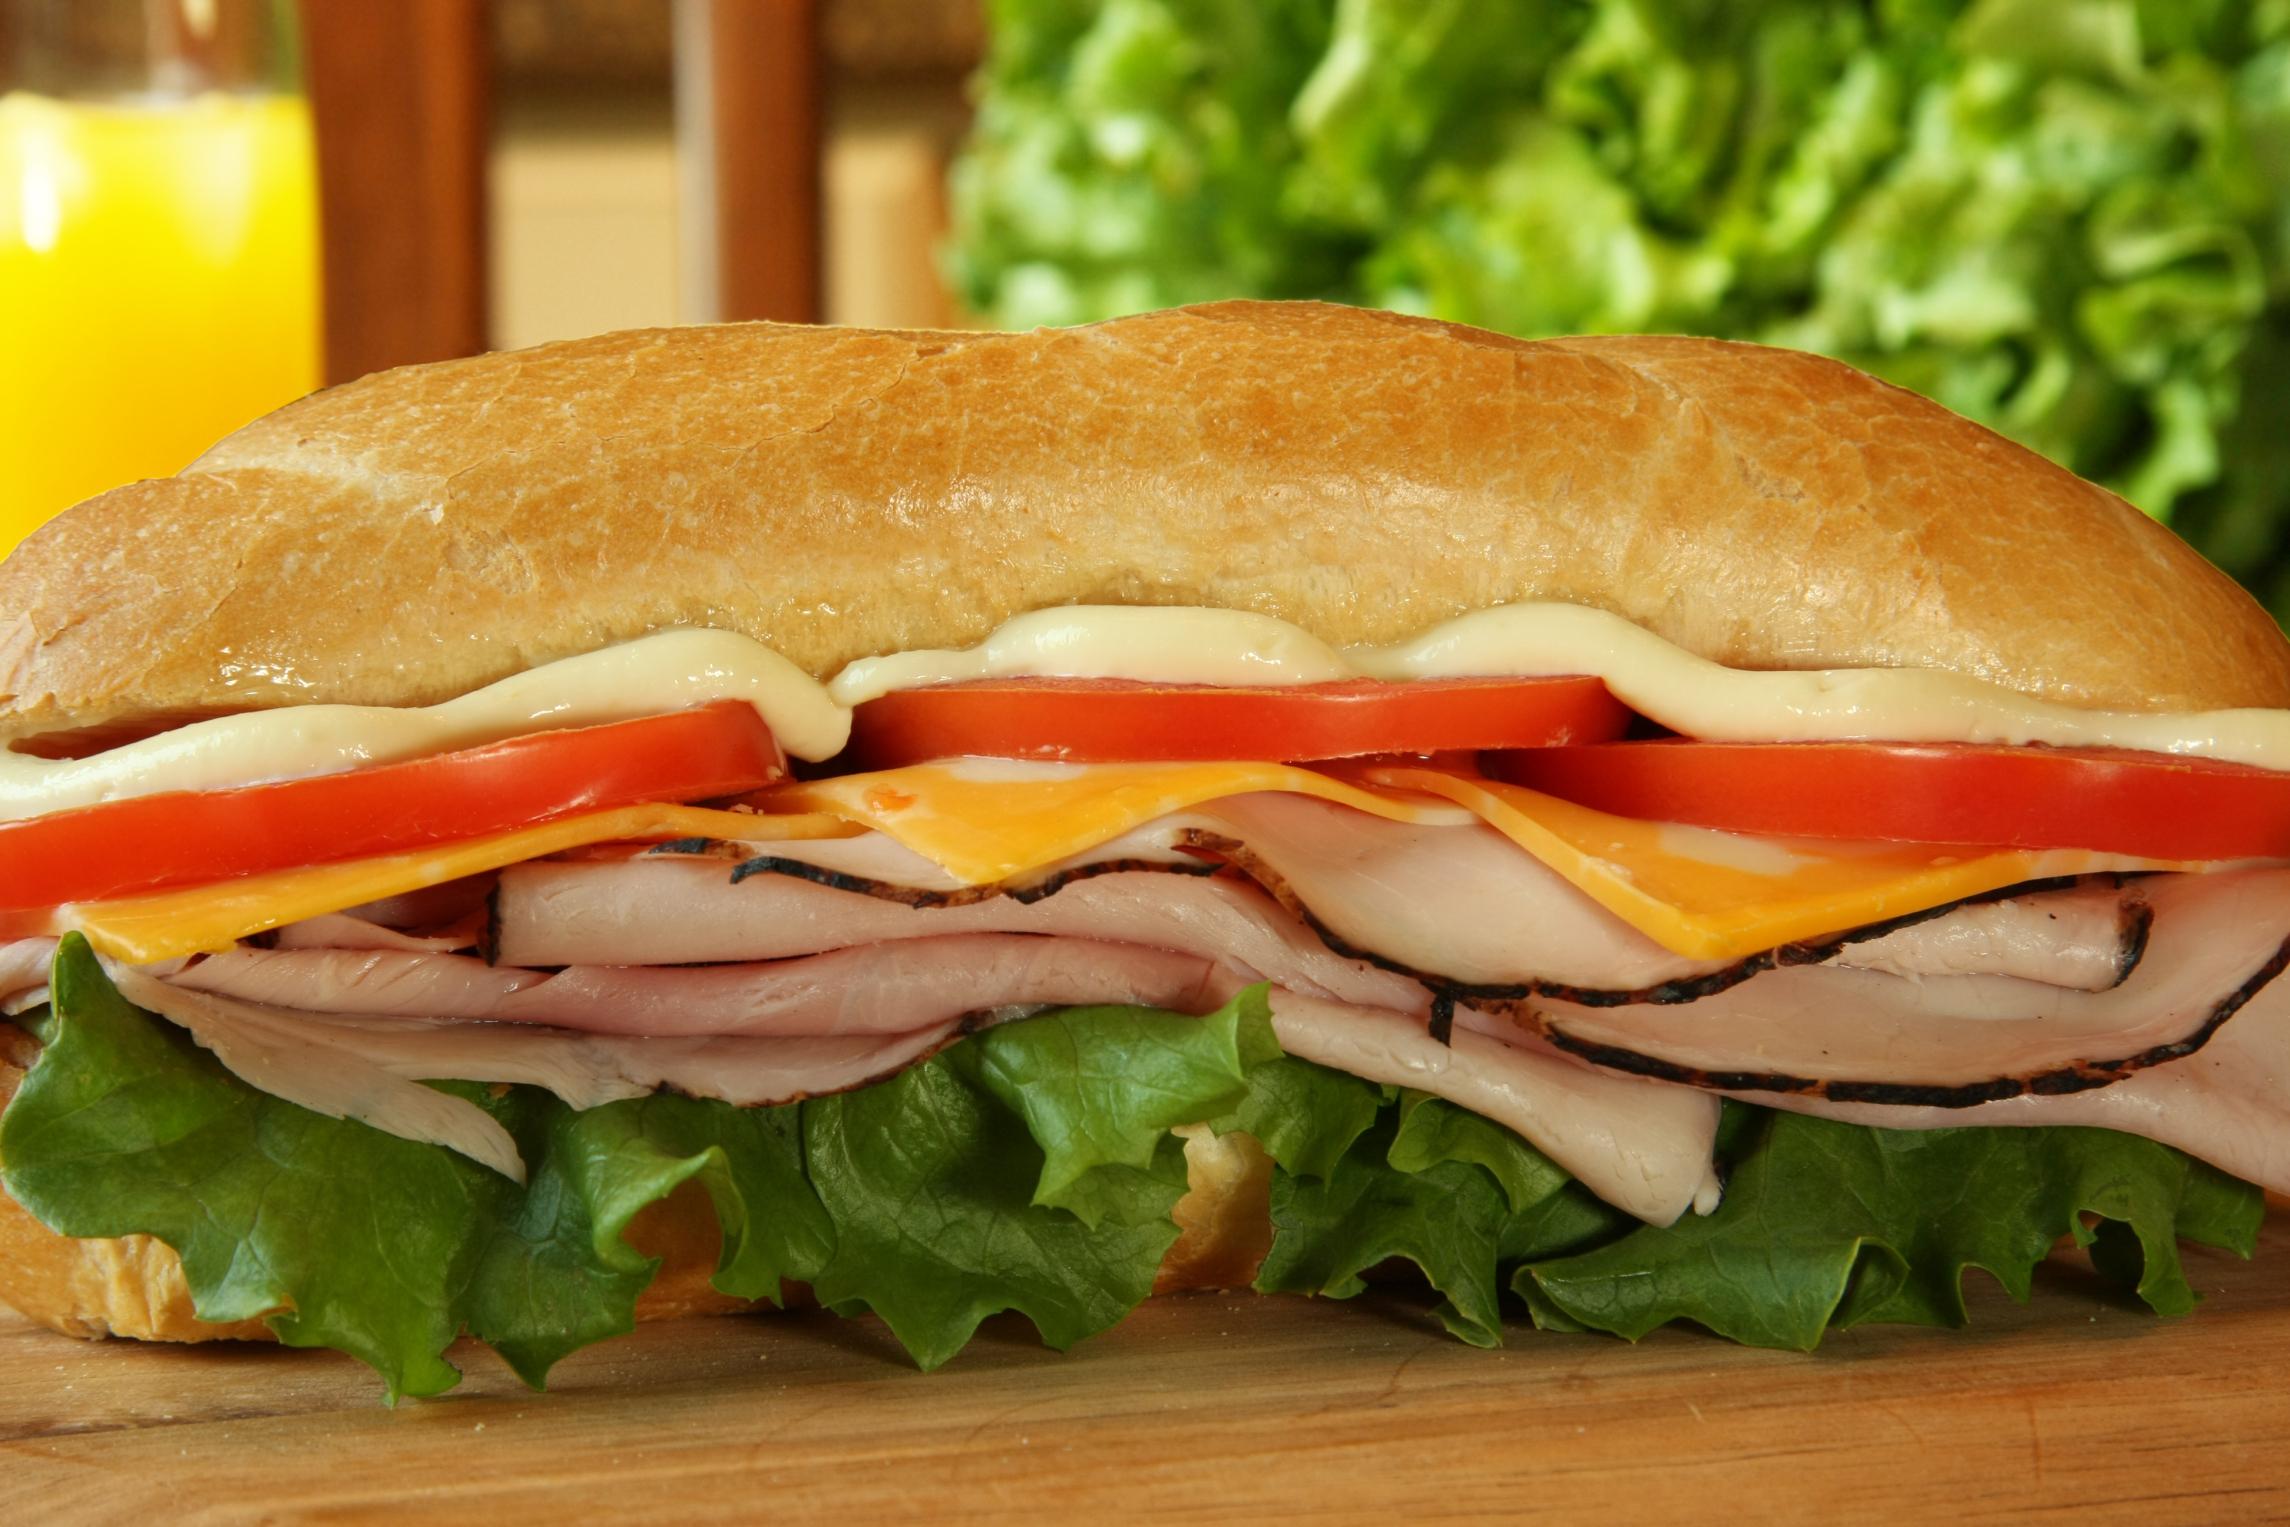 subway sandwich artist training